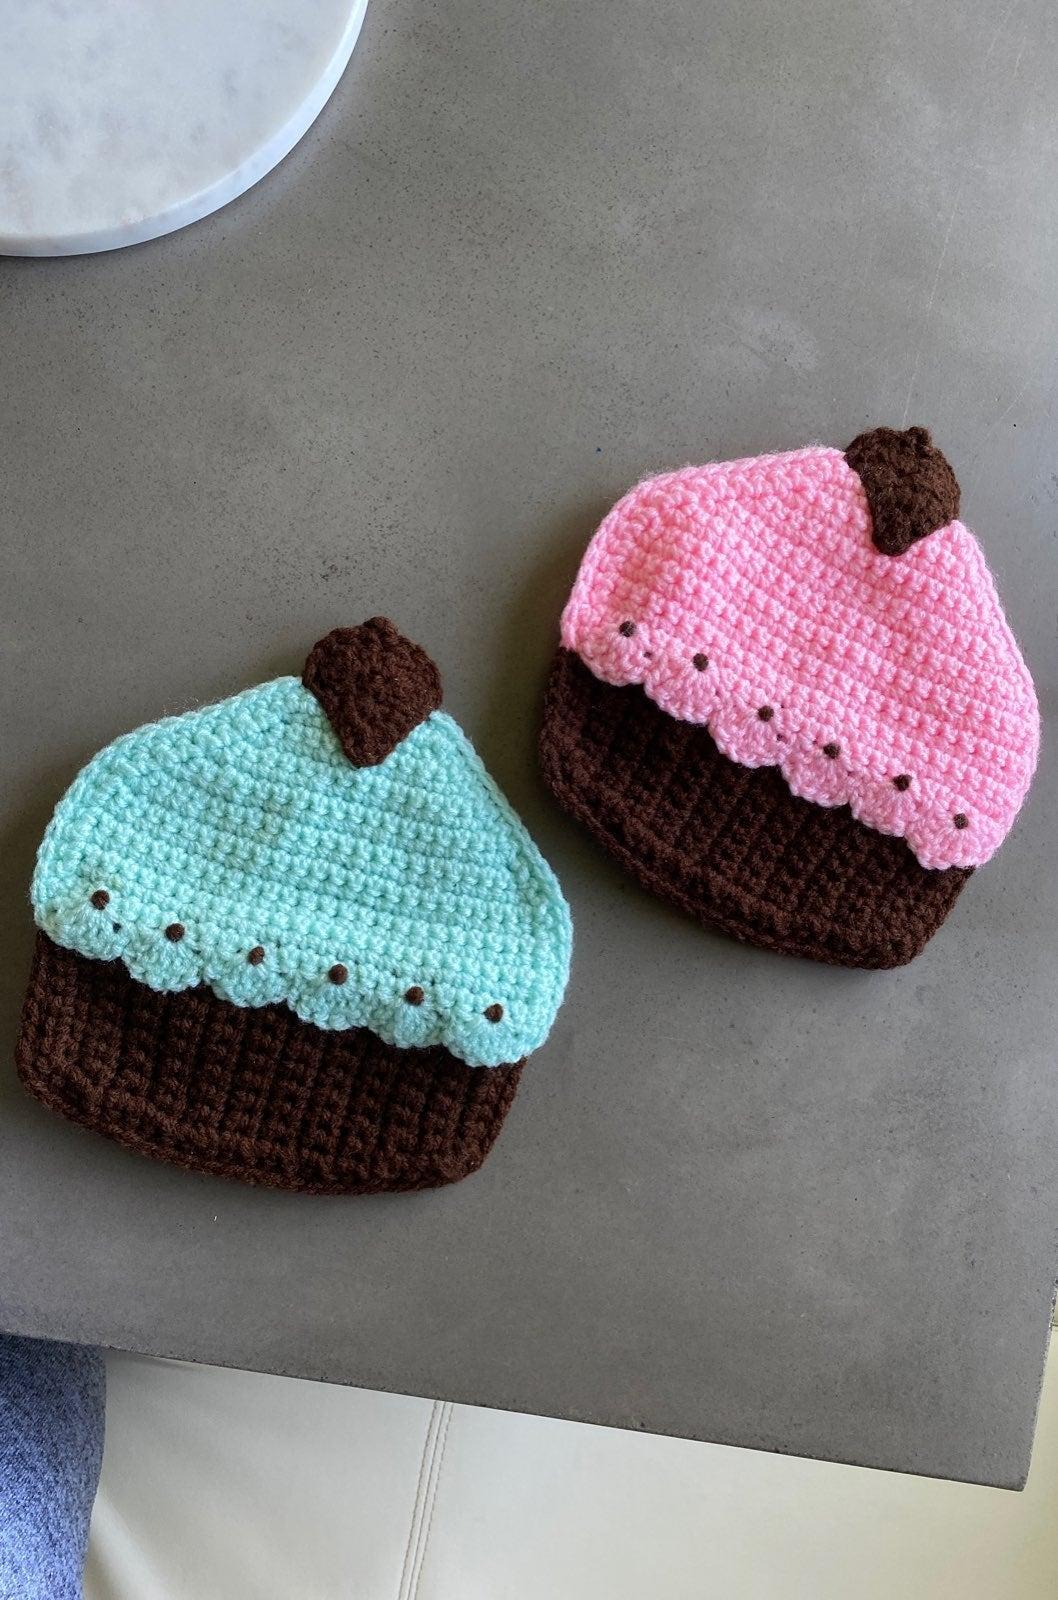 Crochet cupcake oven mitts